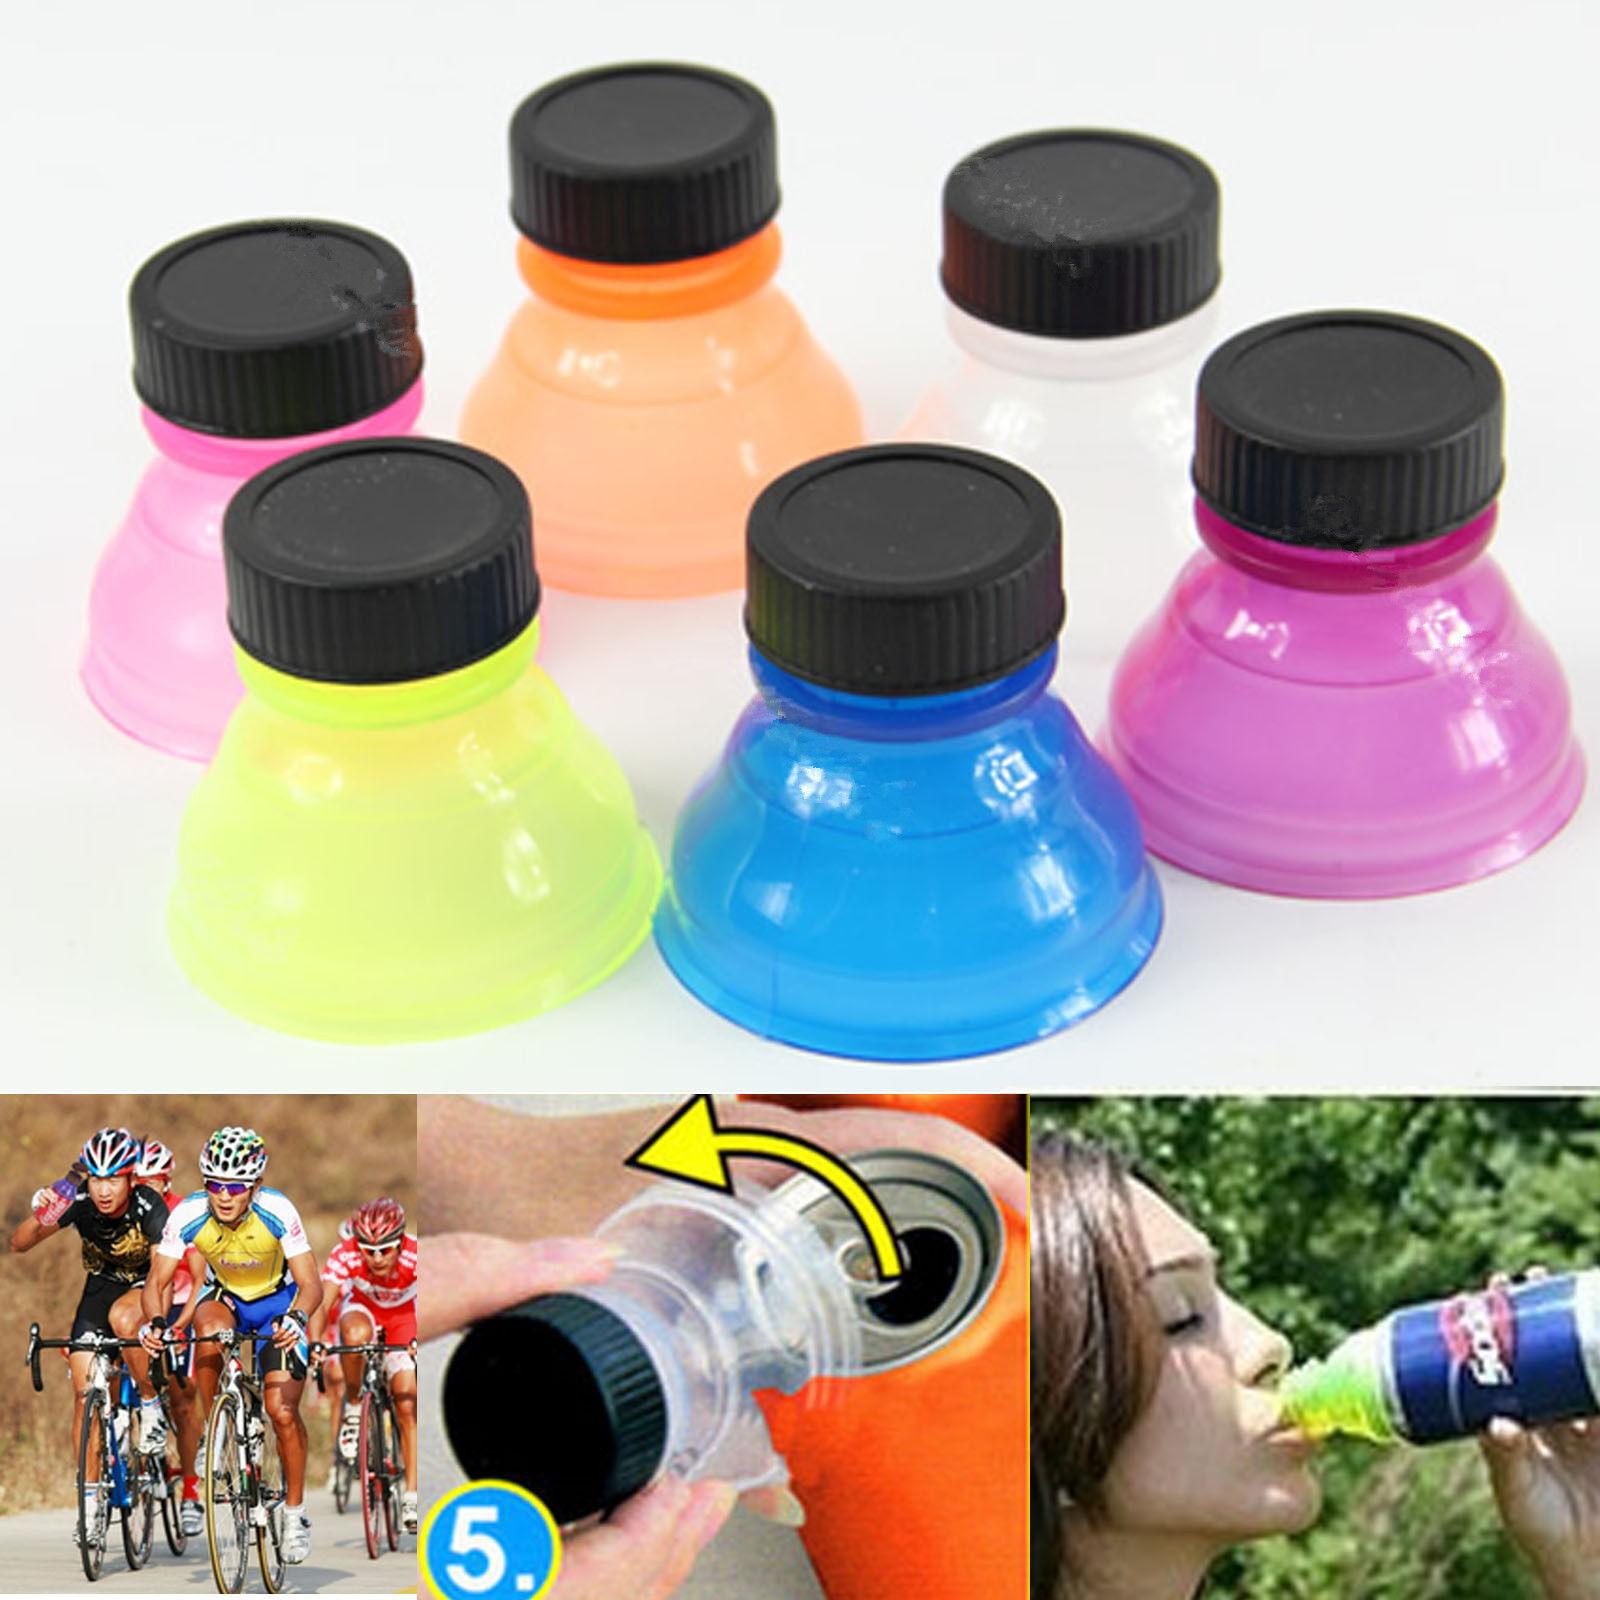 6PCS Snappy Caps Snap Bottle Top Can Covers Fizz Coke Drink Soda Lid Cap Reuse